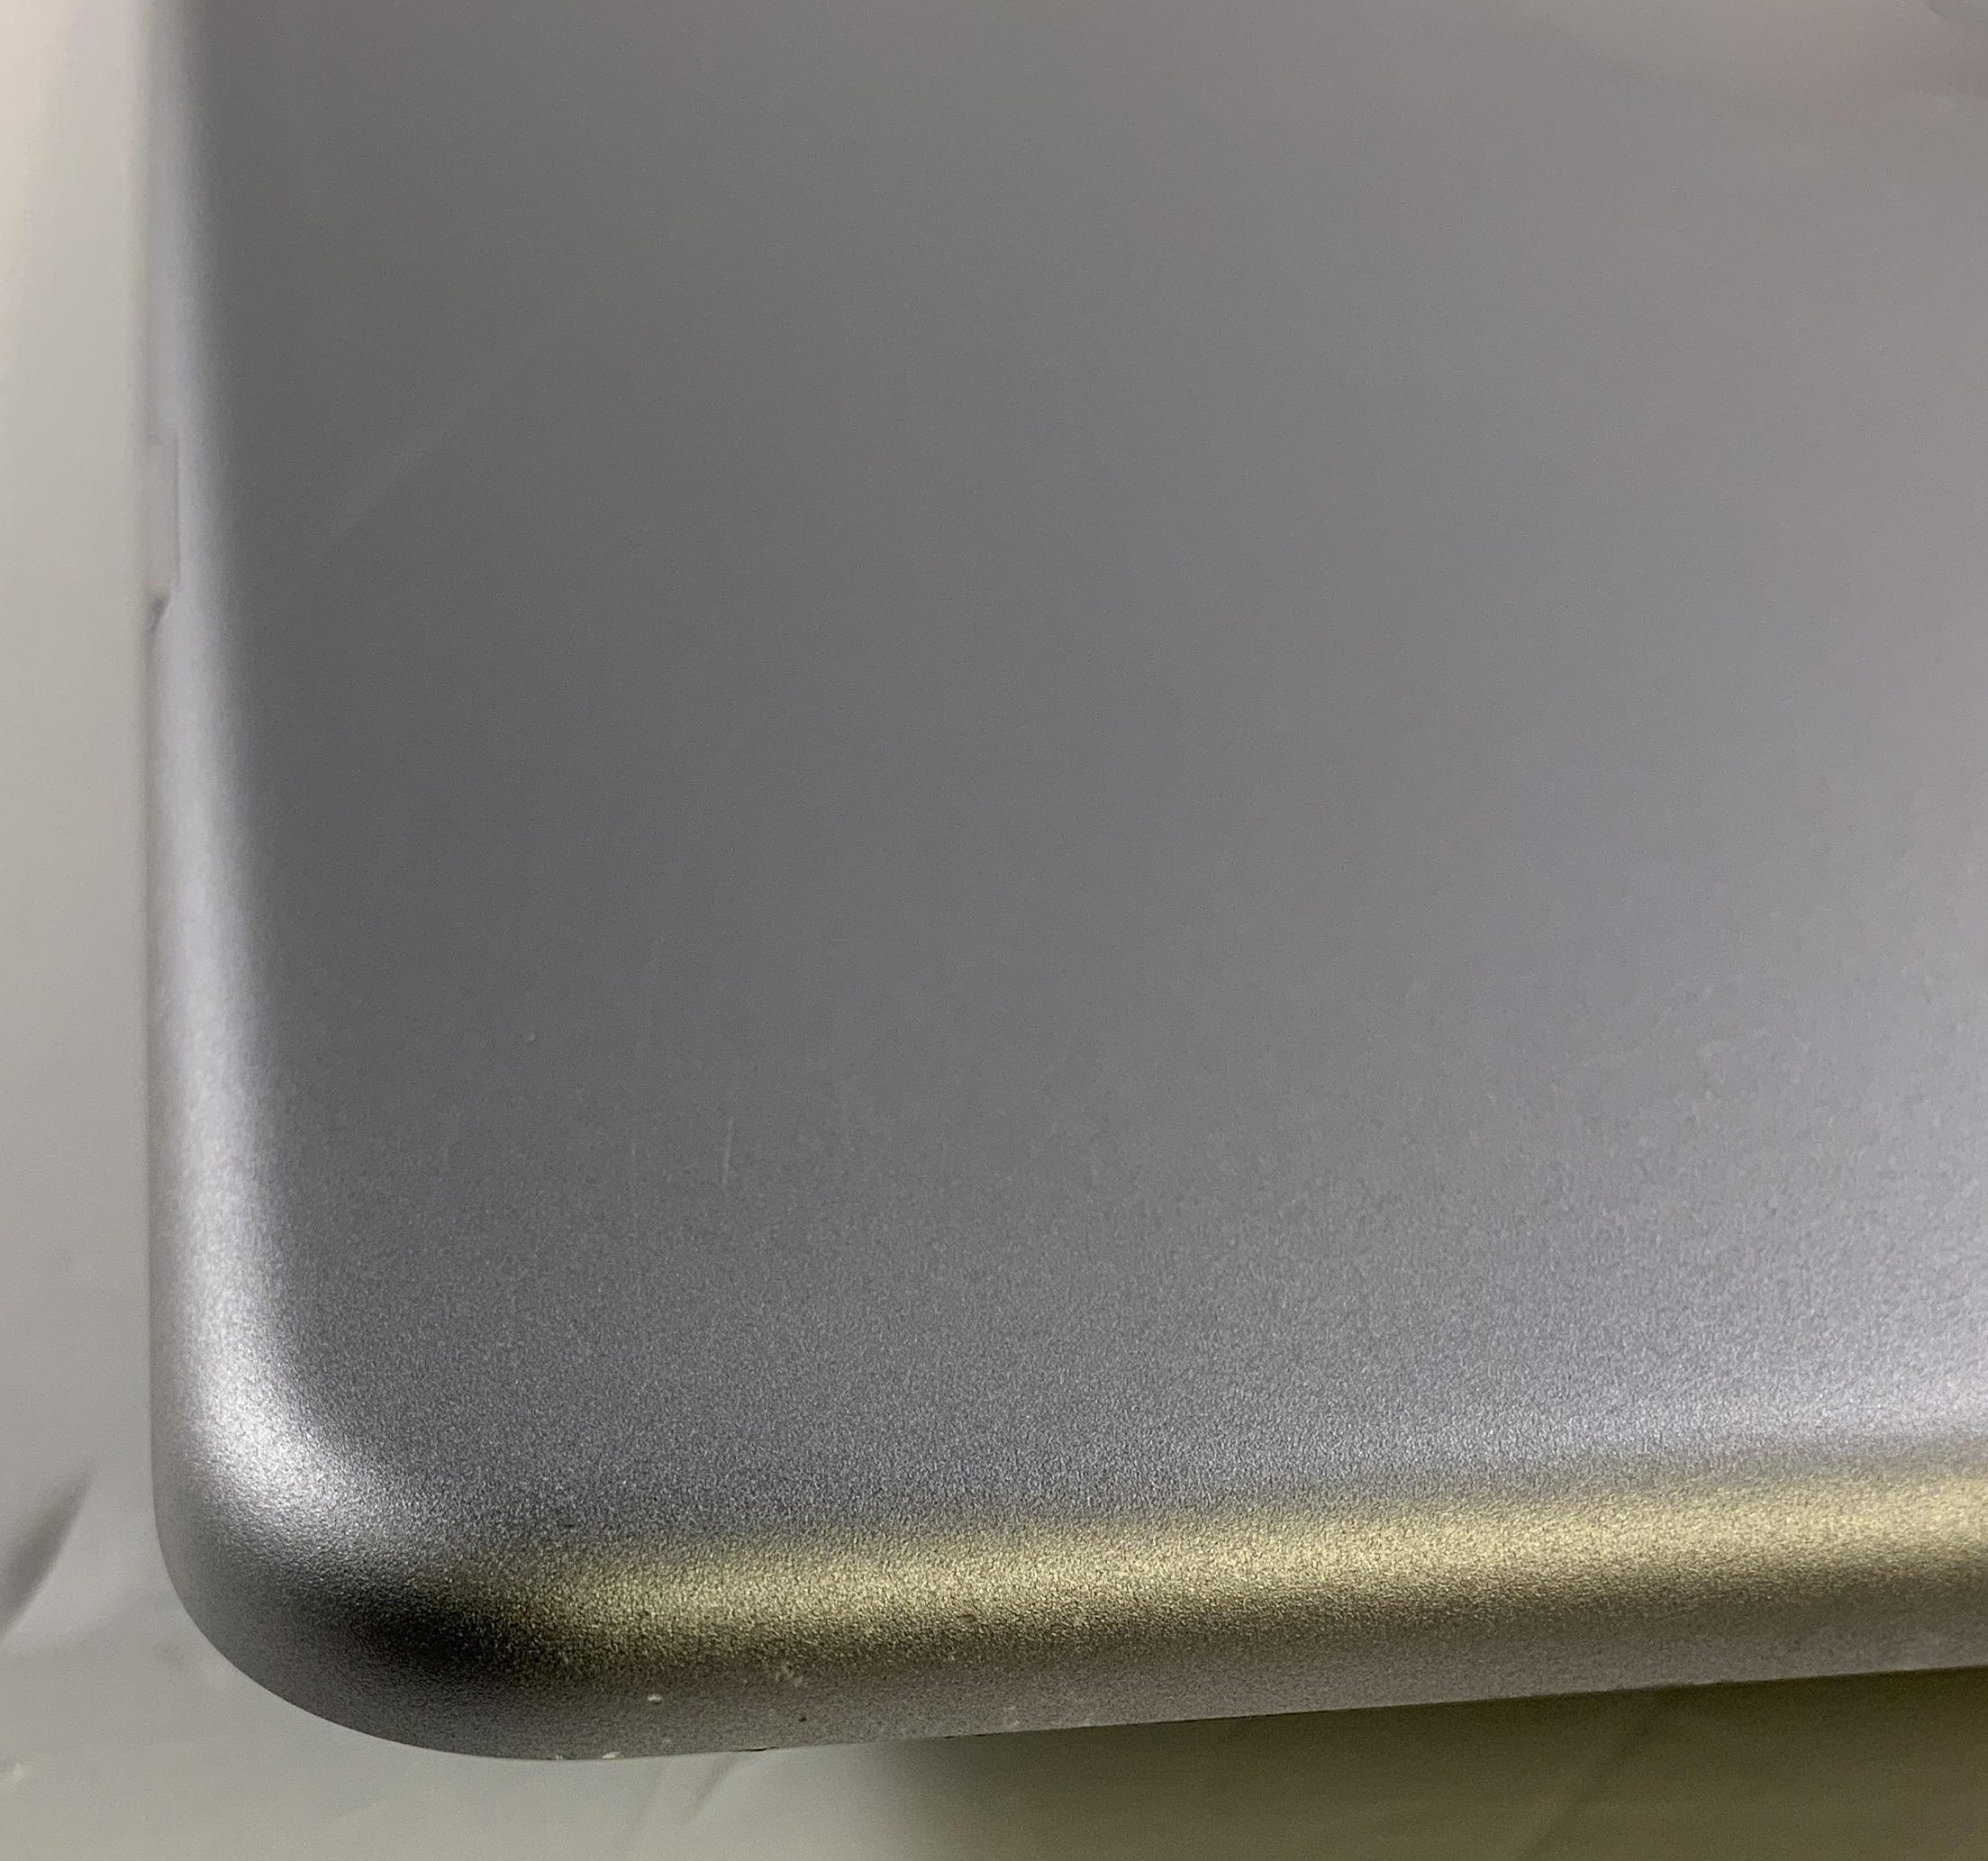 iPad Air 2 Wi-Fi + Cellular 64GB, 64GB, Space Gray, imagen 5